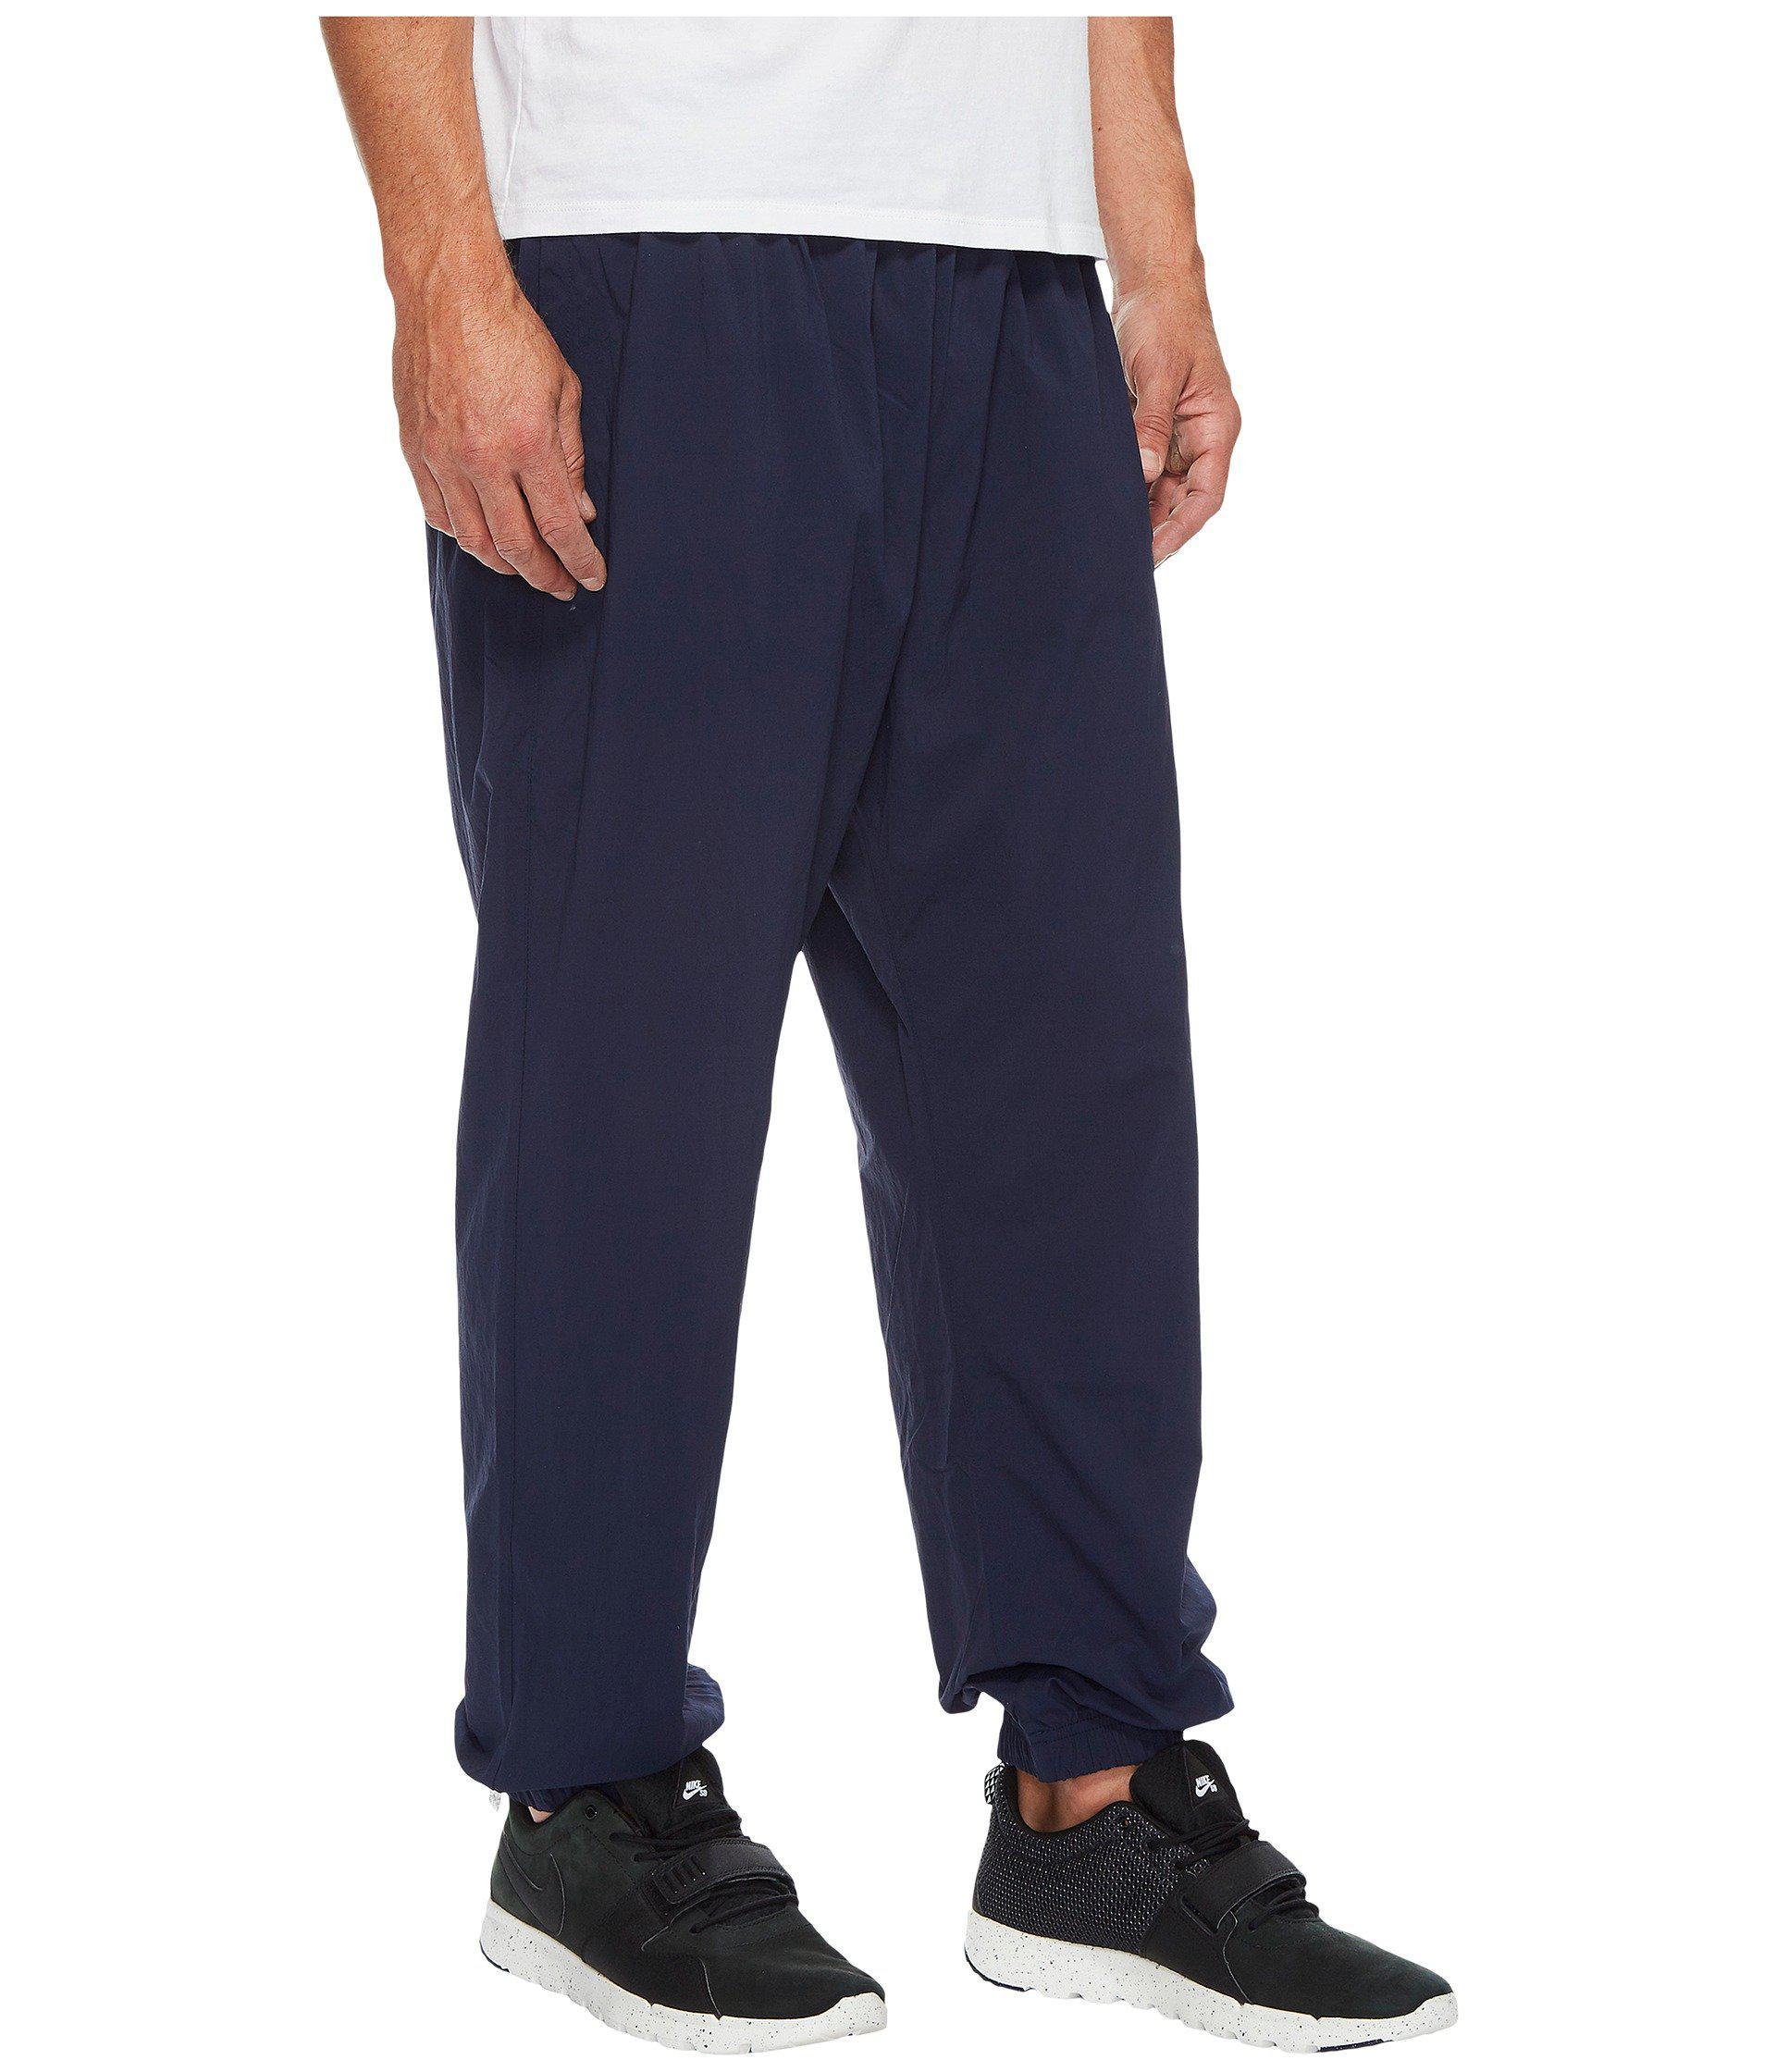 f5b69fb13d02 Lyst - Nike Sb Flex Track Pant (burgundy Crush white) Men s Casual ...